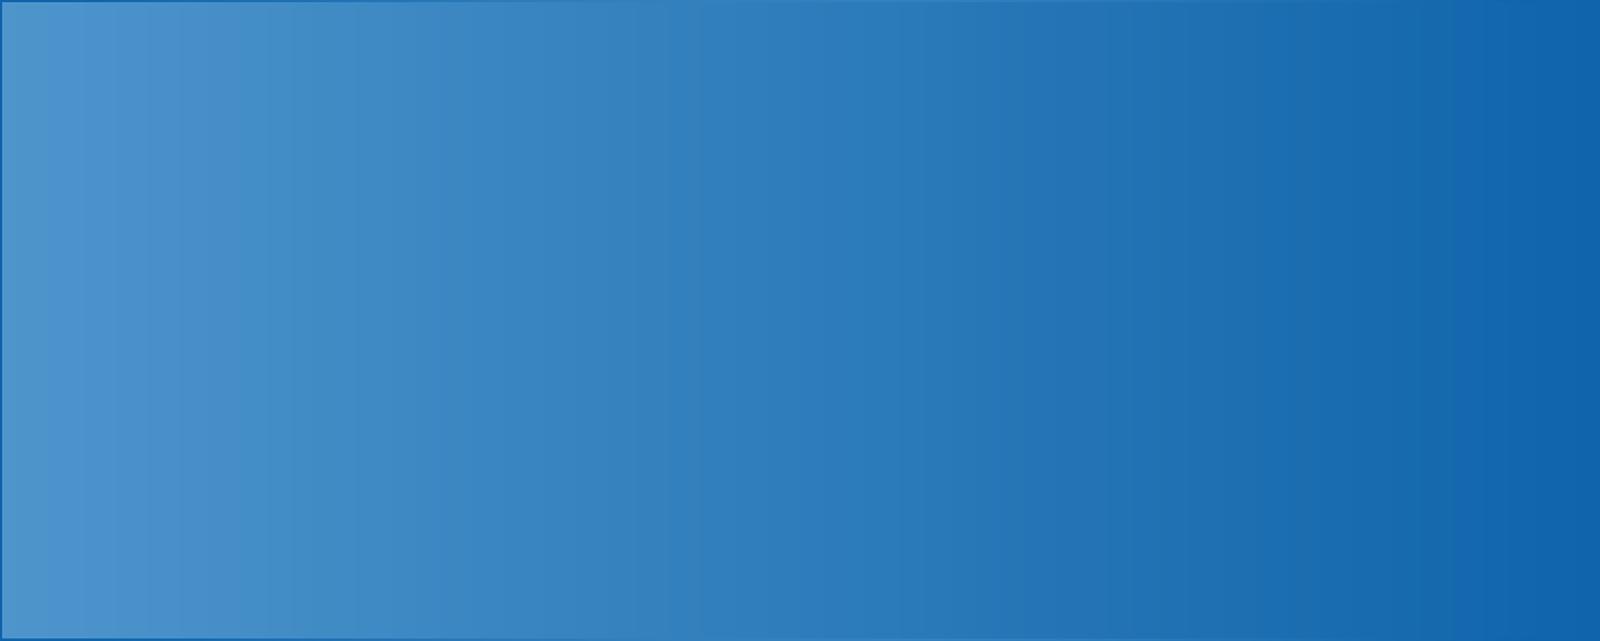 loopspark-web-banner